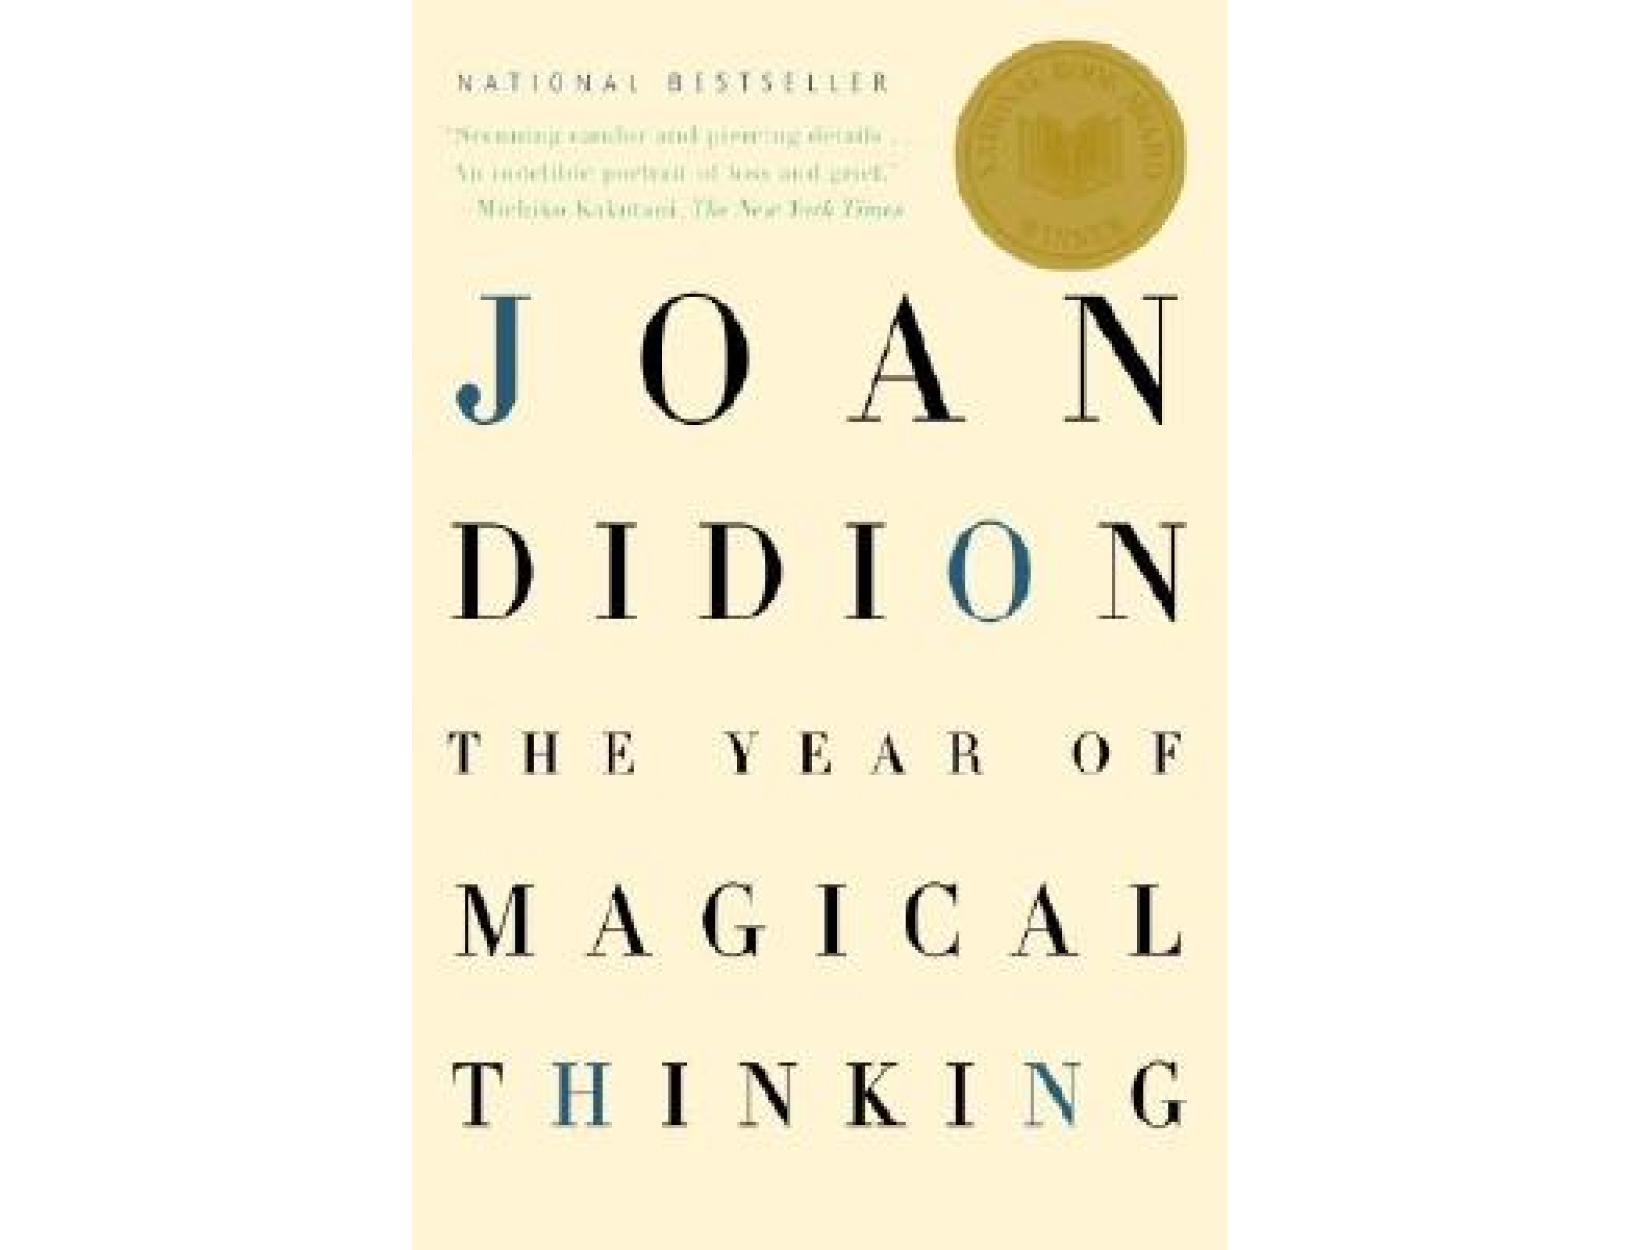 "<em> El año del pensamiento mágico </em> de Joan Didion (con un lado de <em> Wonder Boys </em>)""/></a></li> <li><a href="